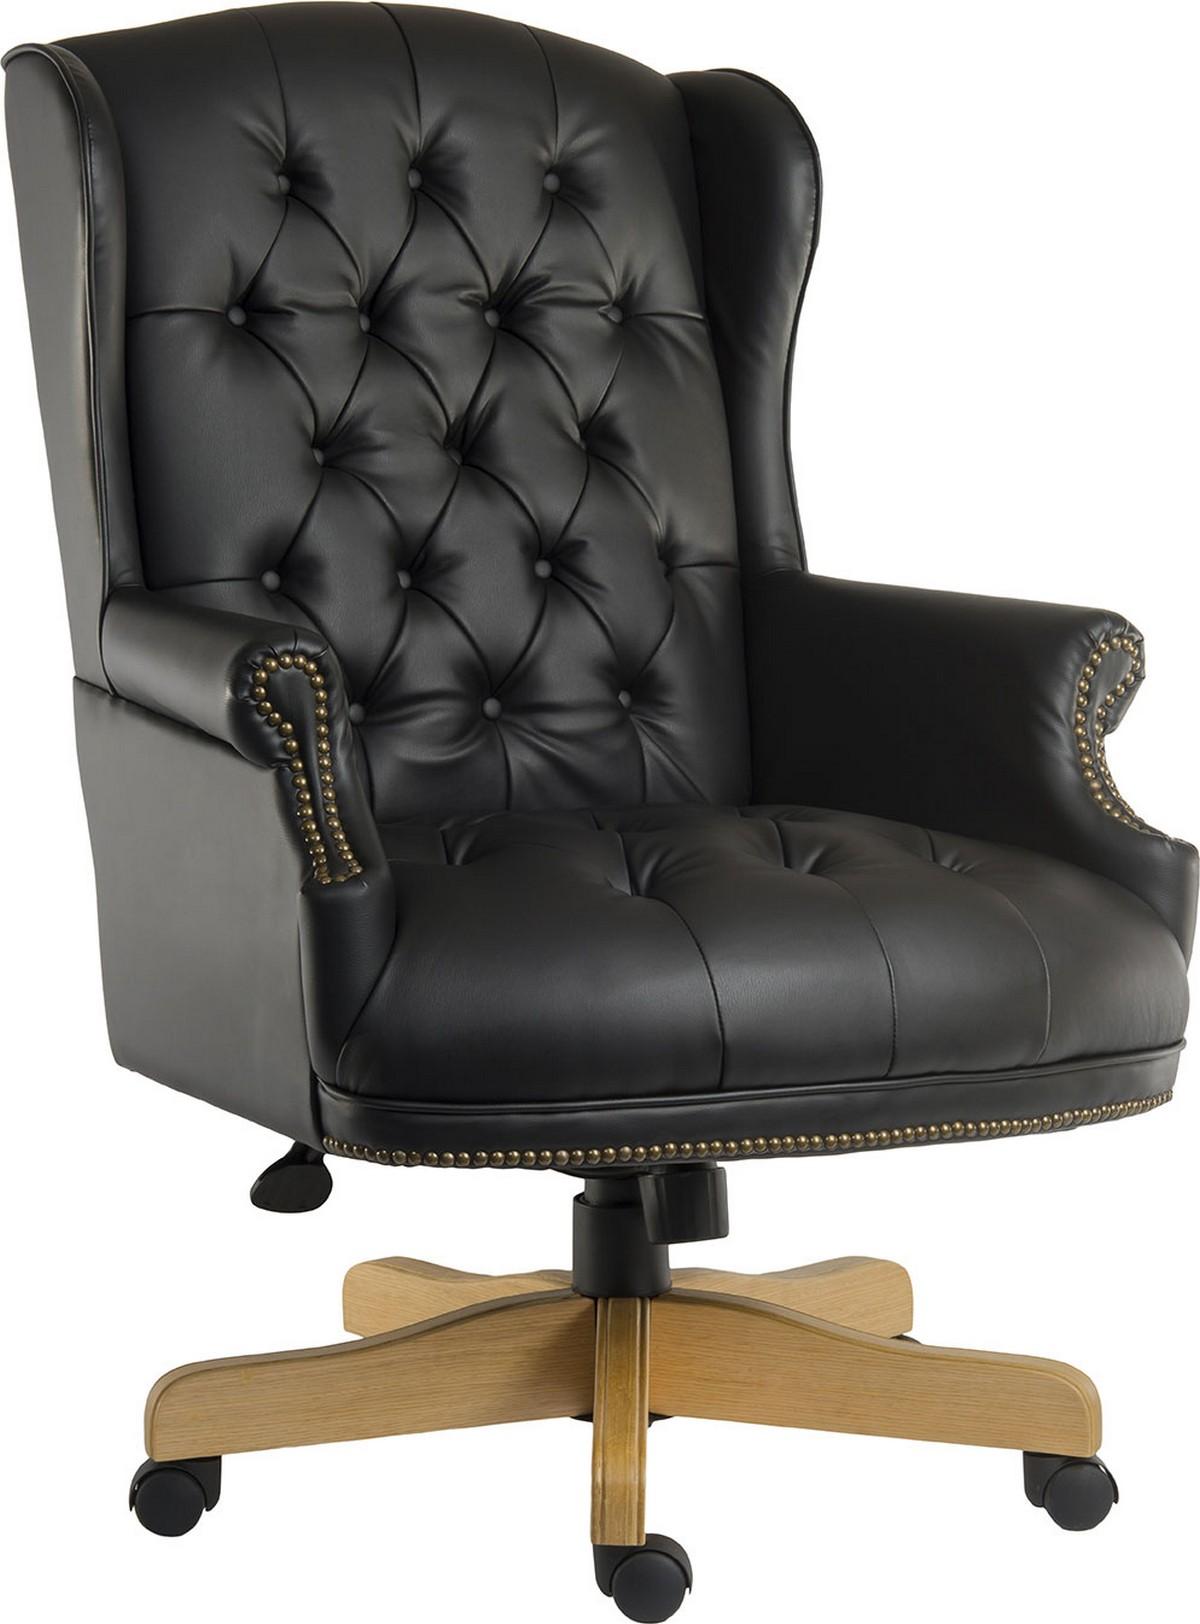 Chairman Executive Black Office Chair